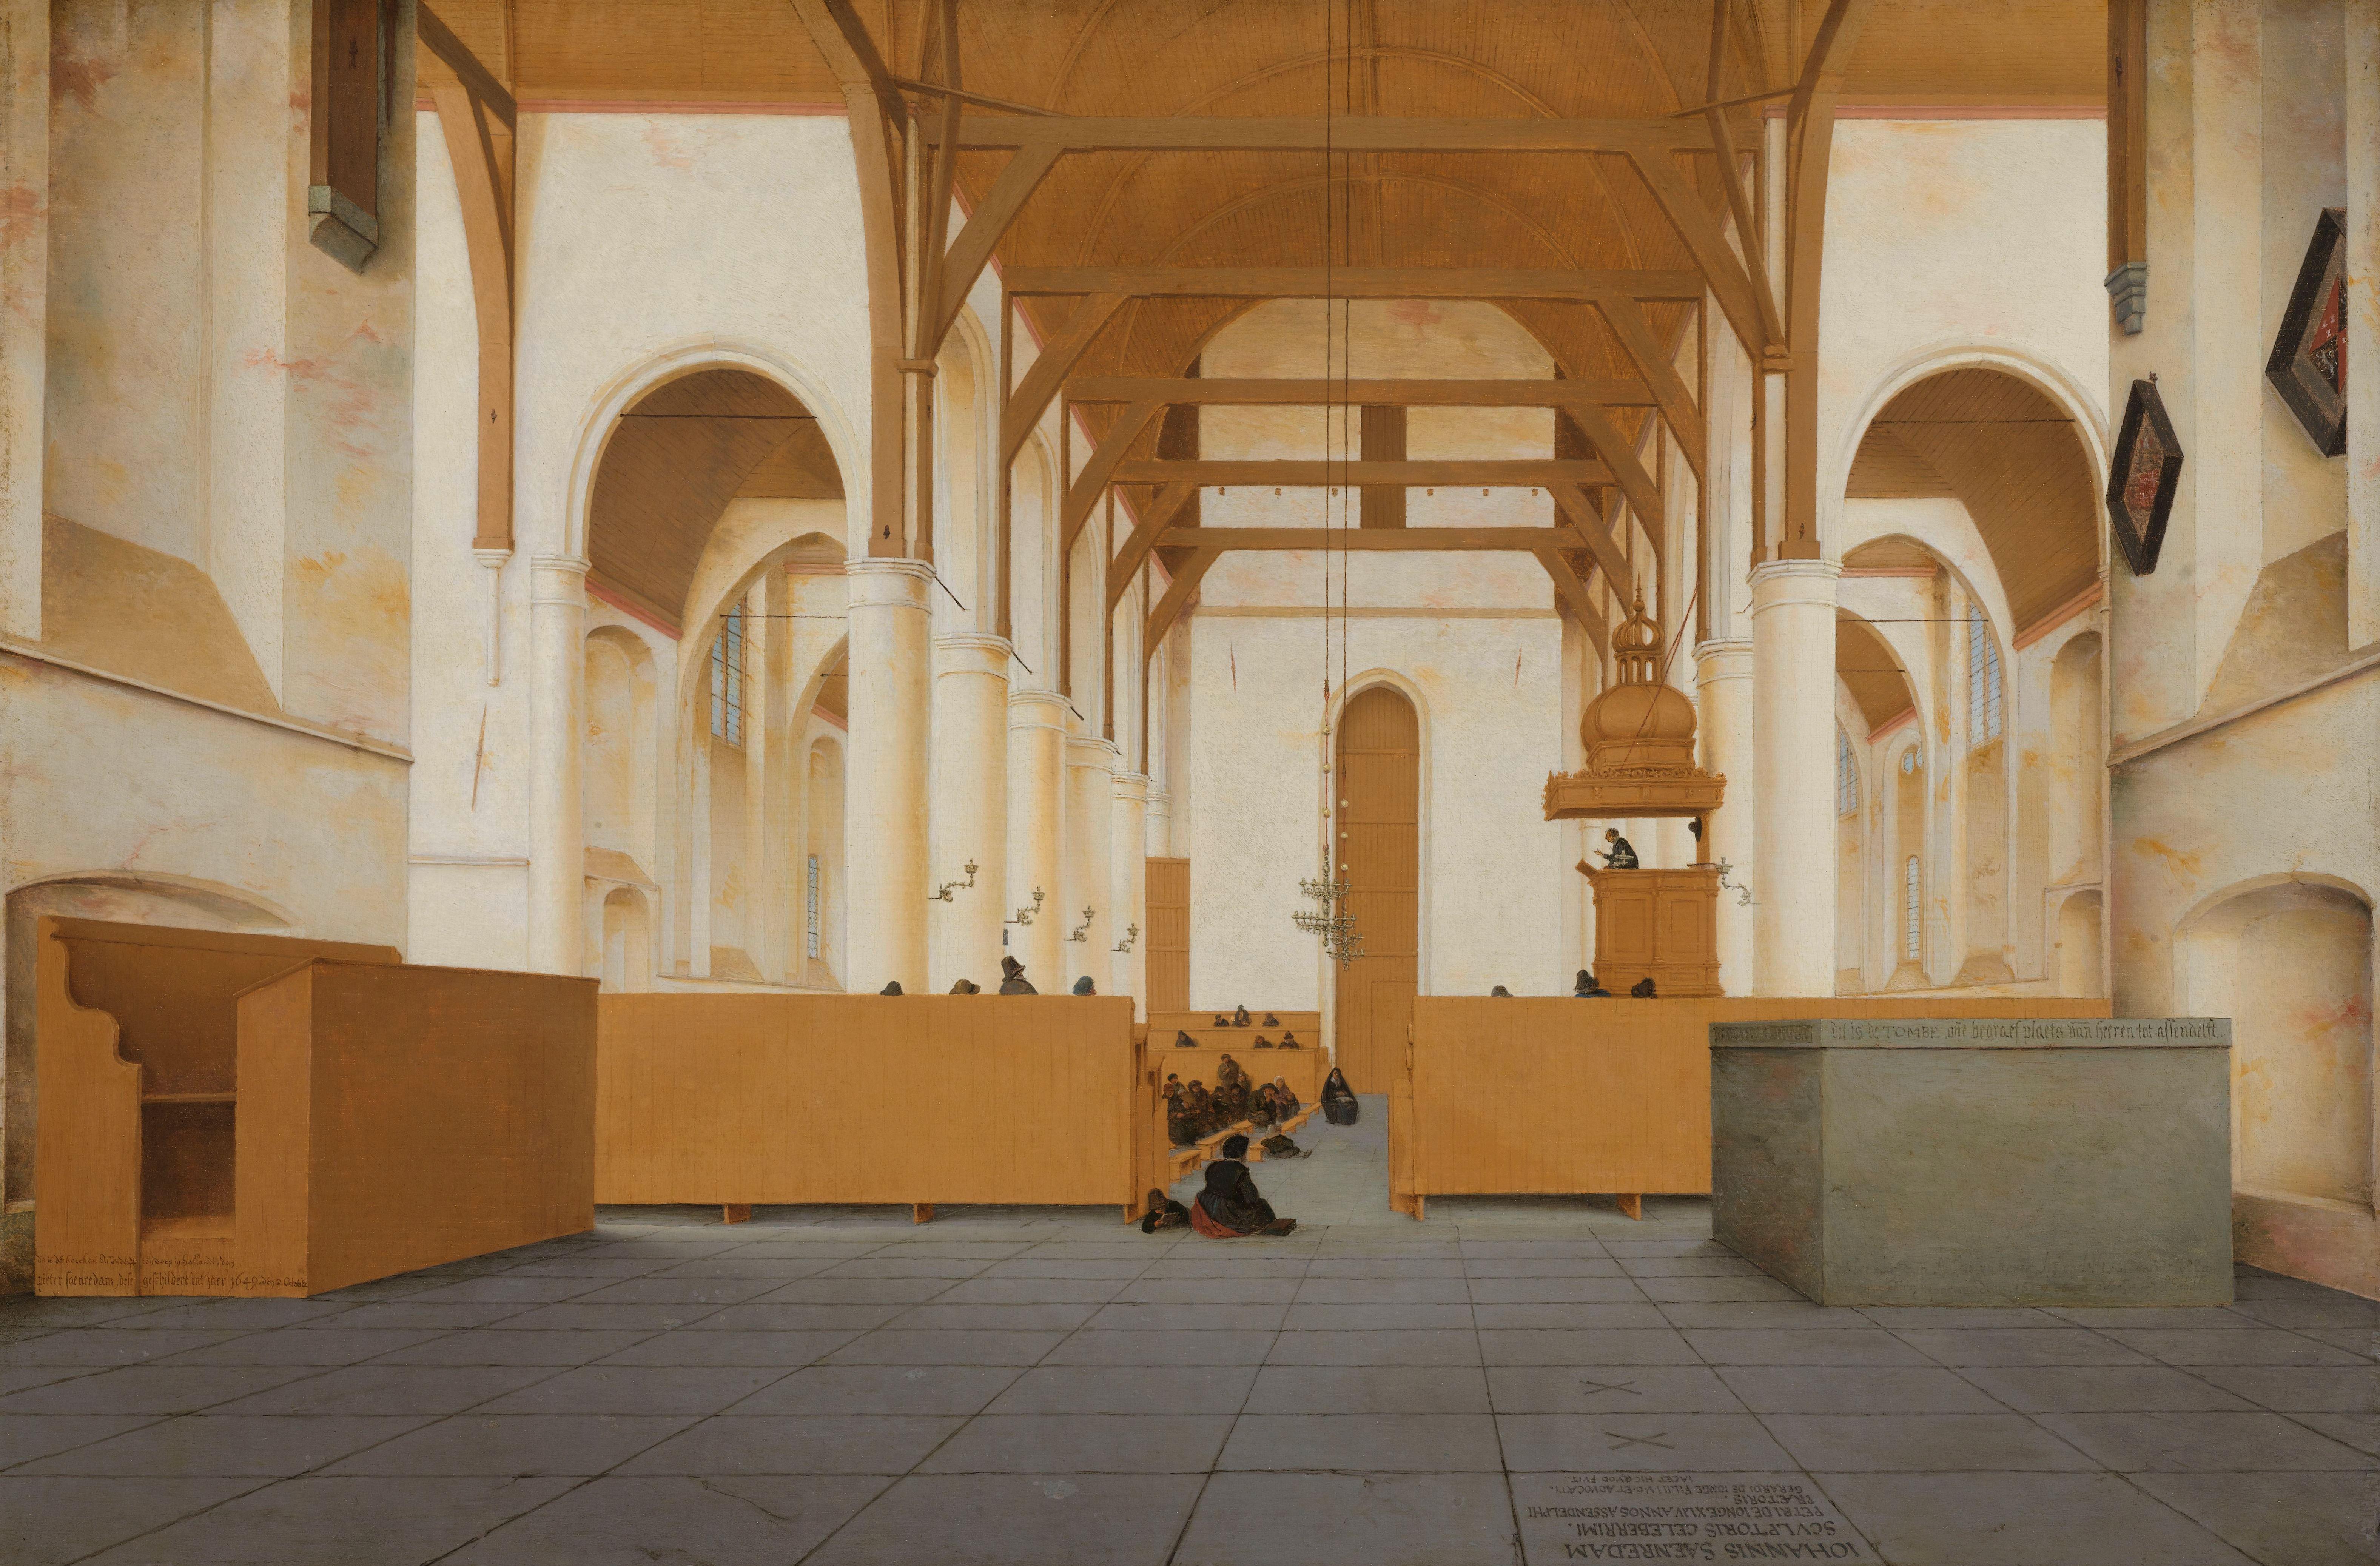 https://upload.wikimedia.org/wikipedia/commons/3/3e/Interieur_van_de_Sint-Odulphuskerk_in_Assendelft_Rijksmuseum_SK-C-217.jpeg